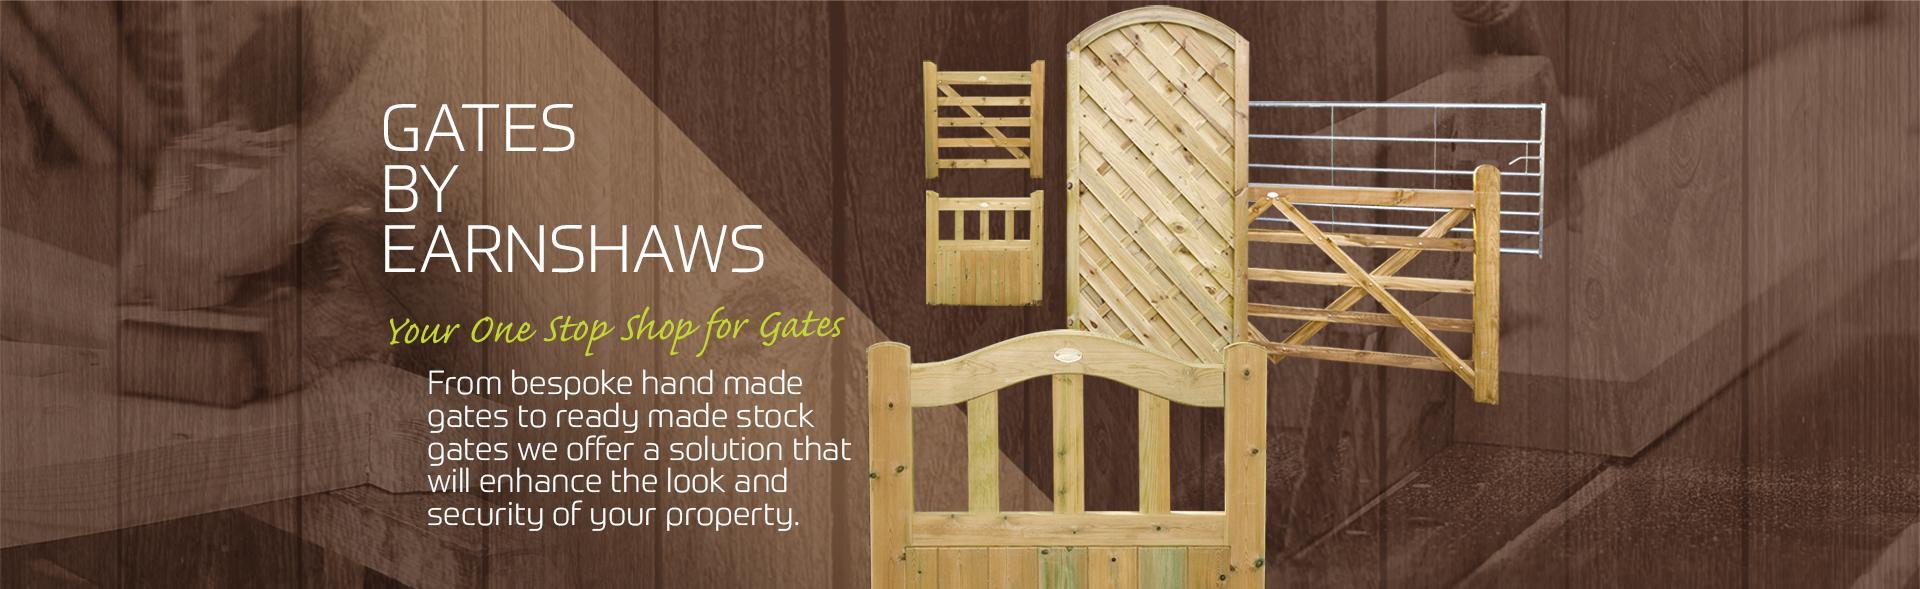 Gates by Earnshaw's